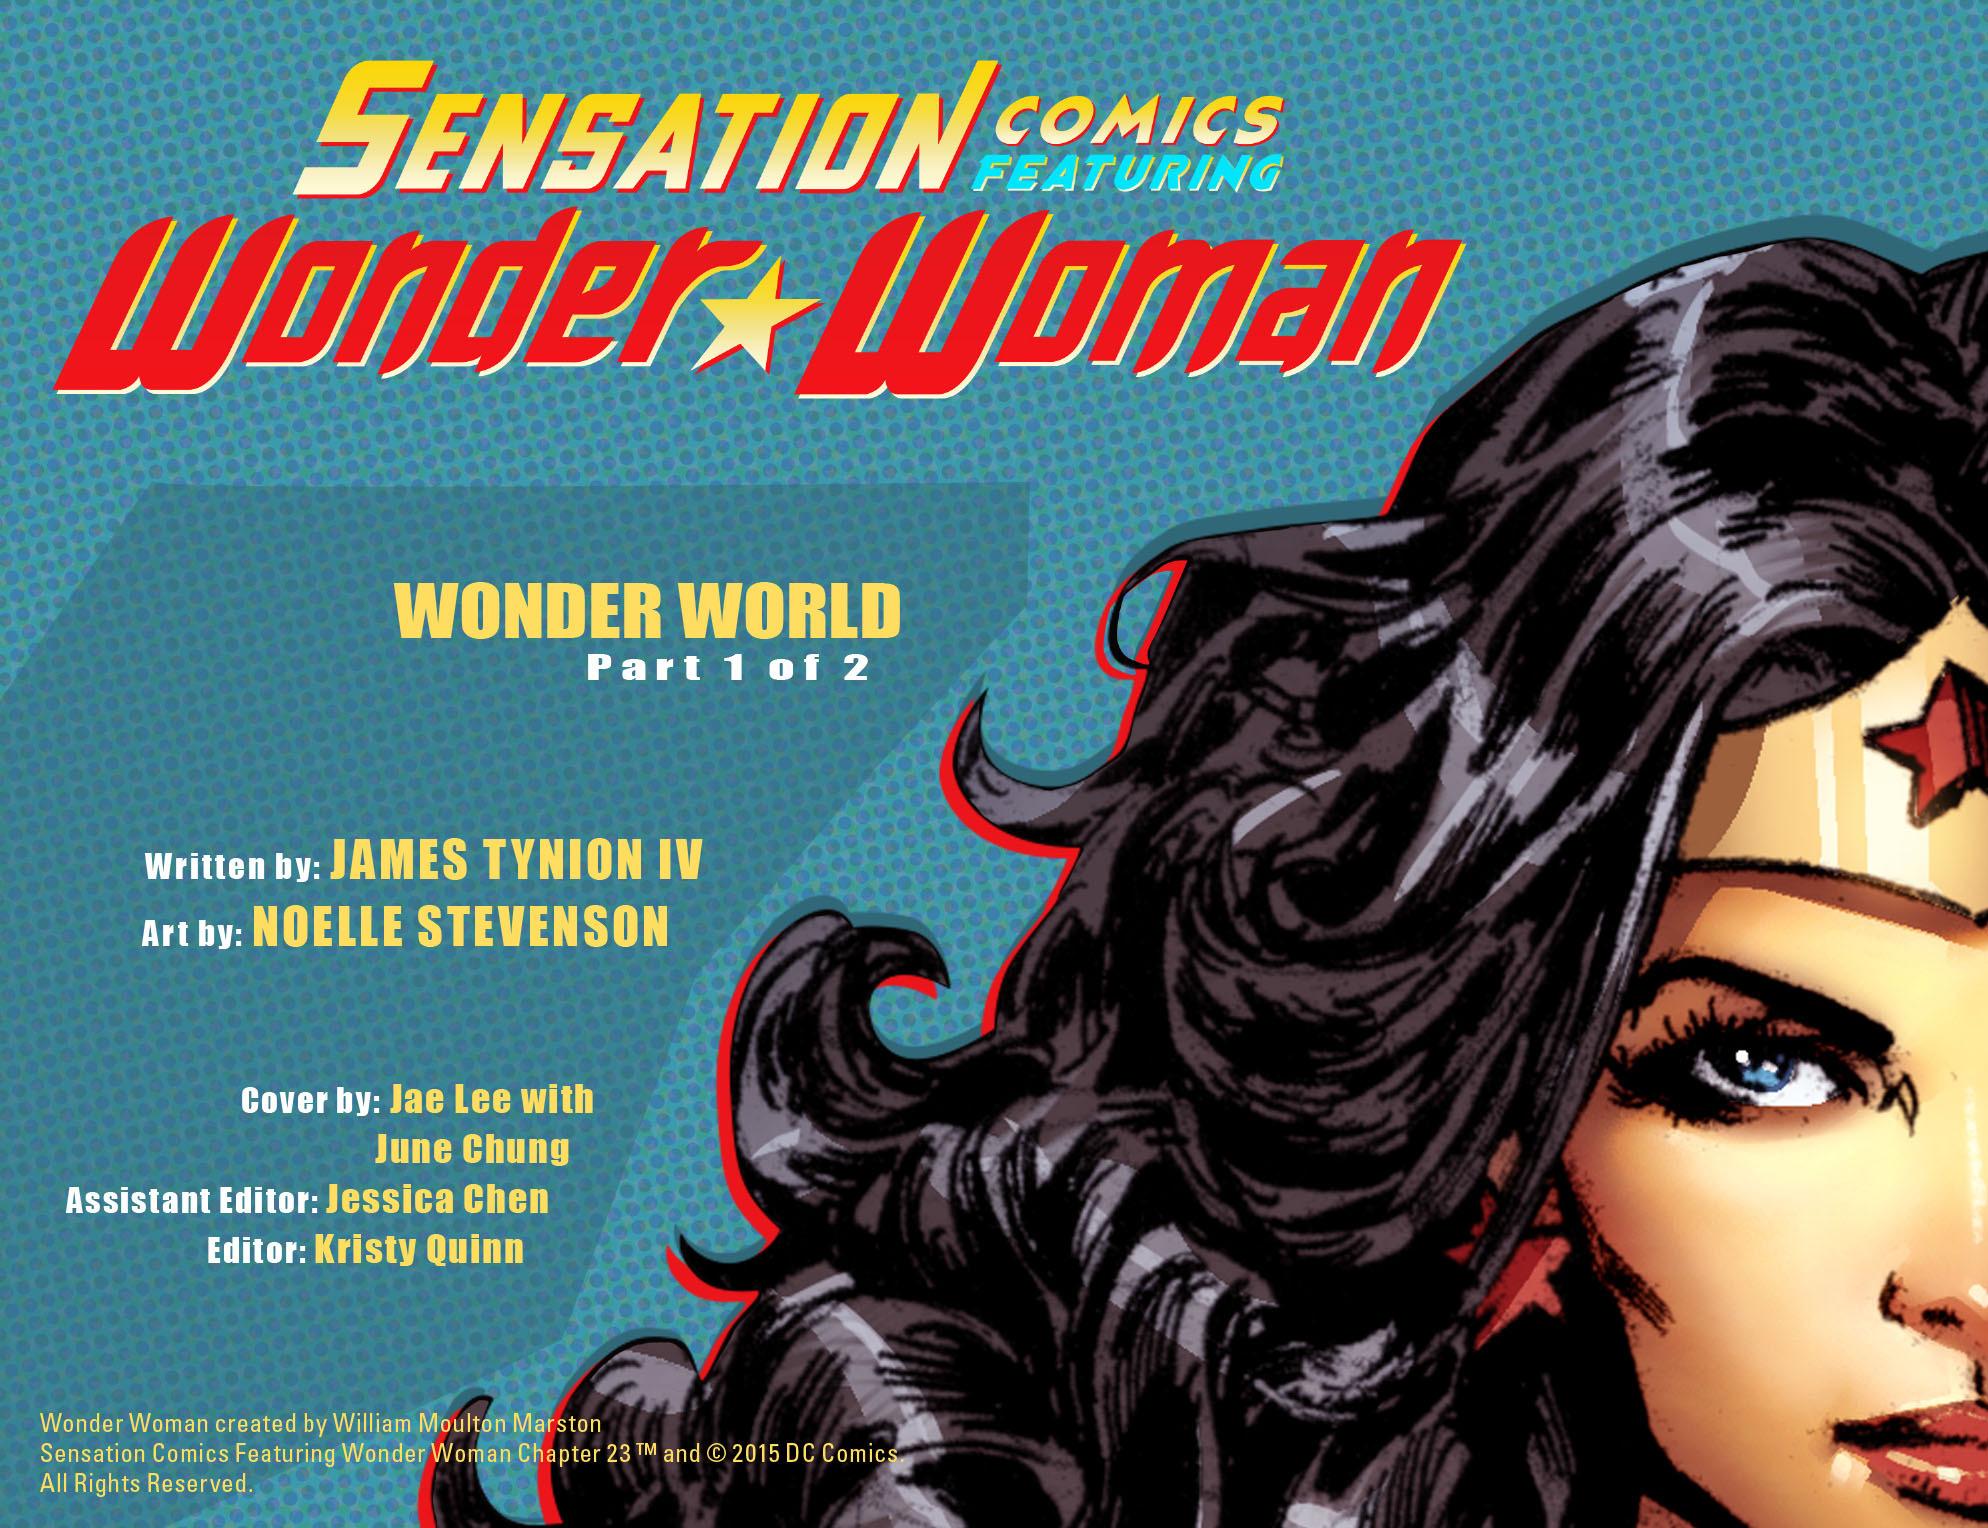 Read online Sensation Comics Featuring Wonder Woman comic -  Issue #23 - 2